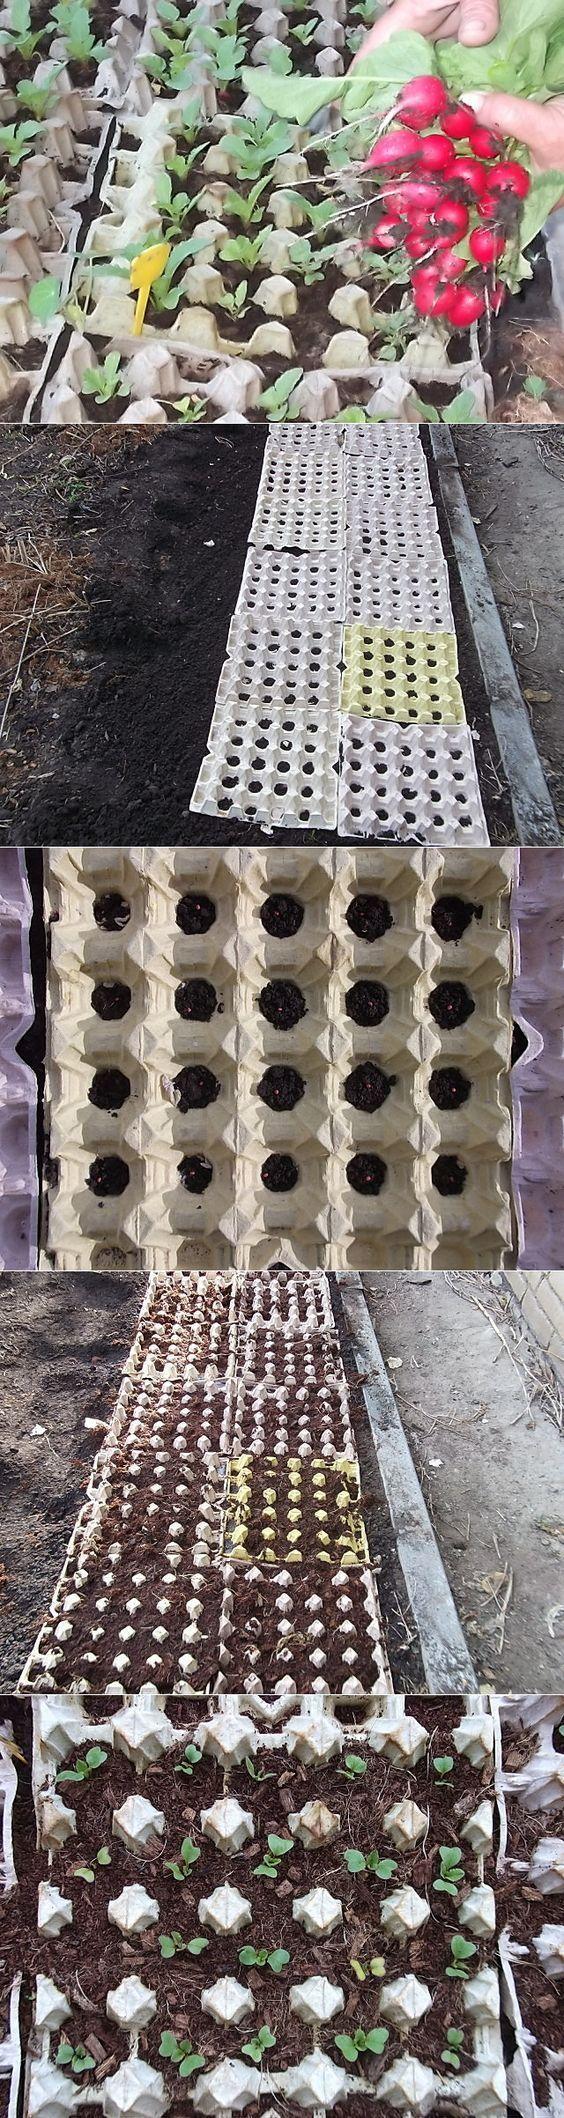 Radis boîte oeufs jardin potager